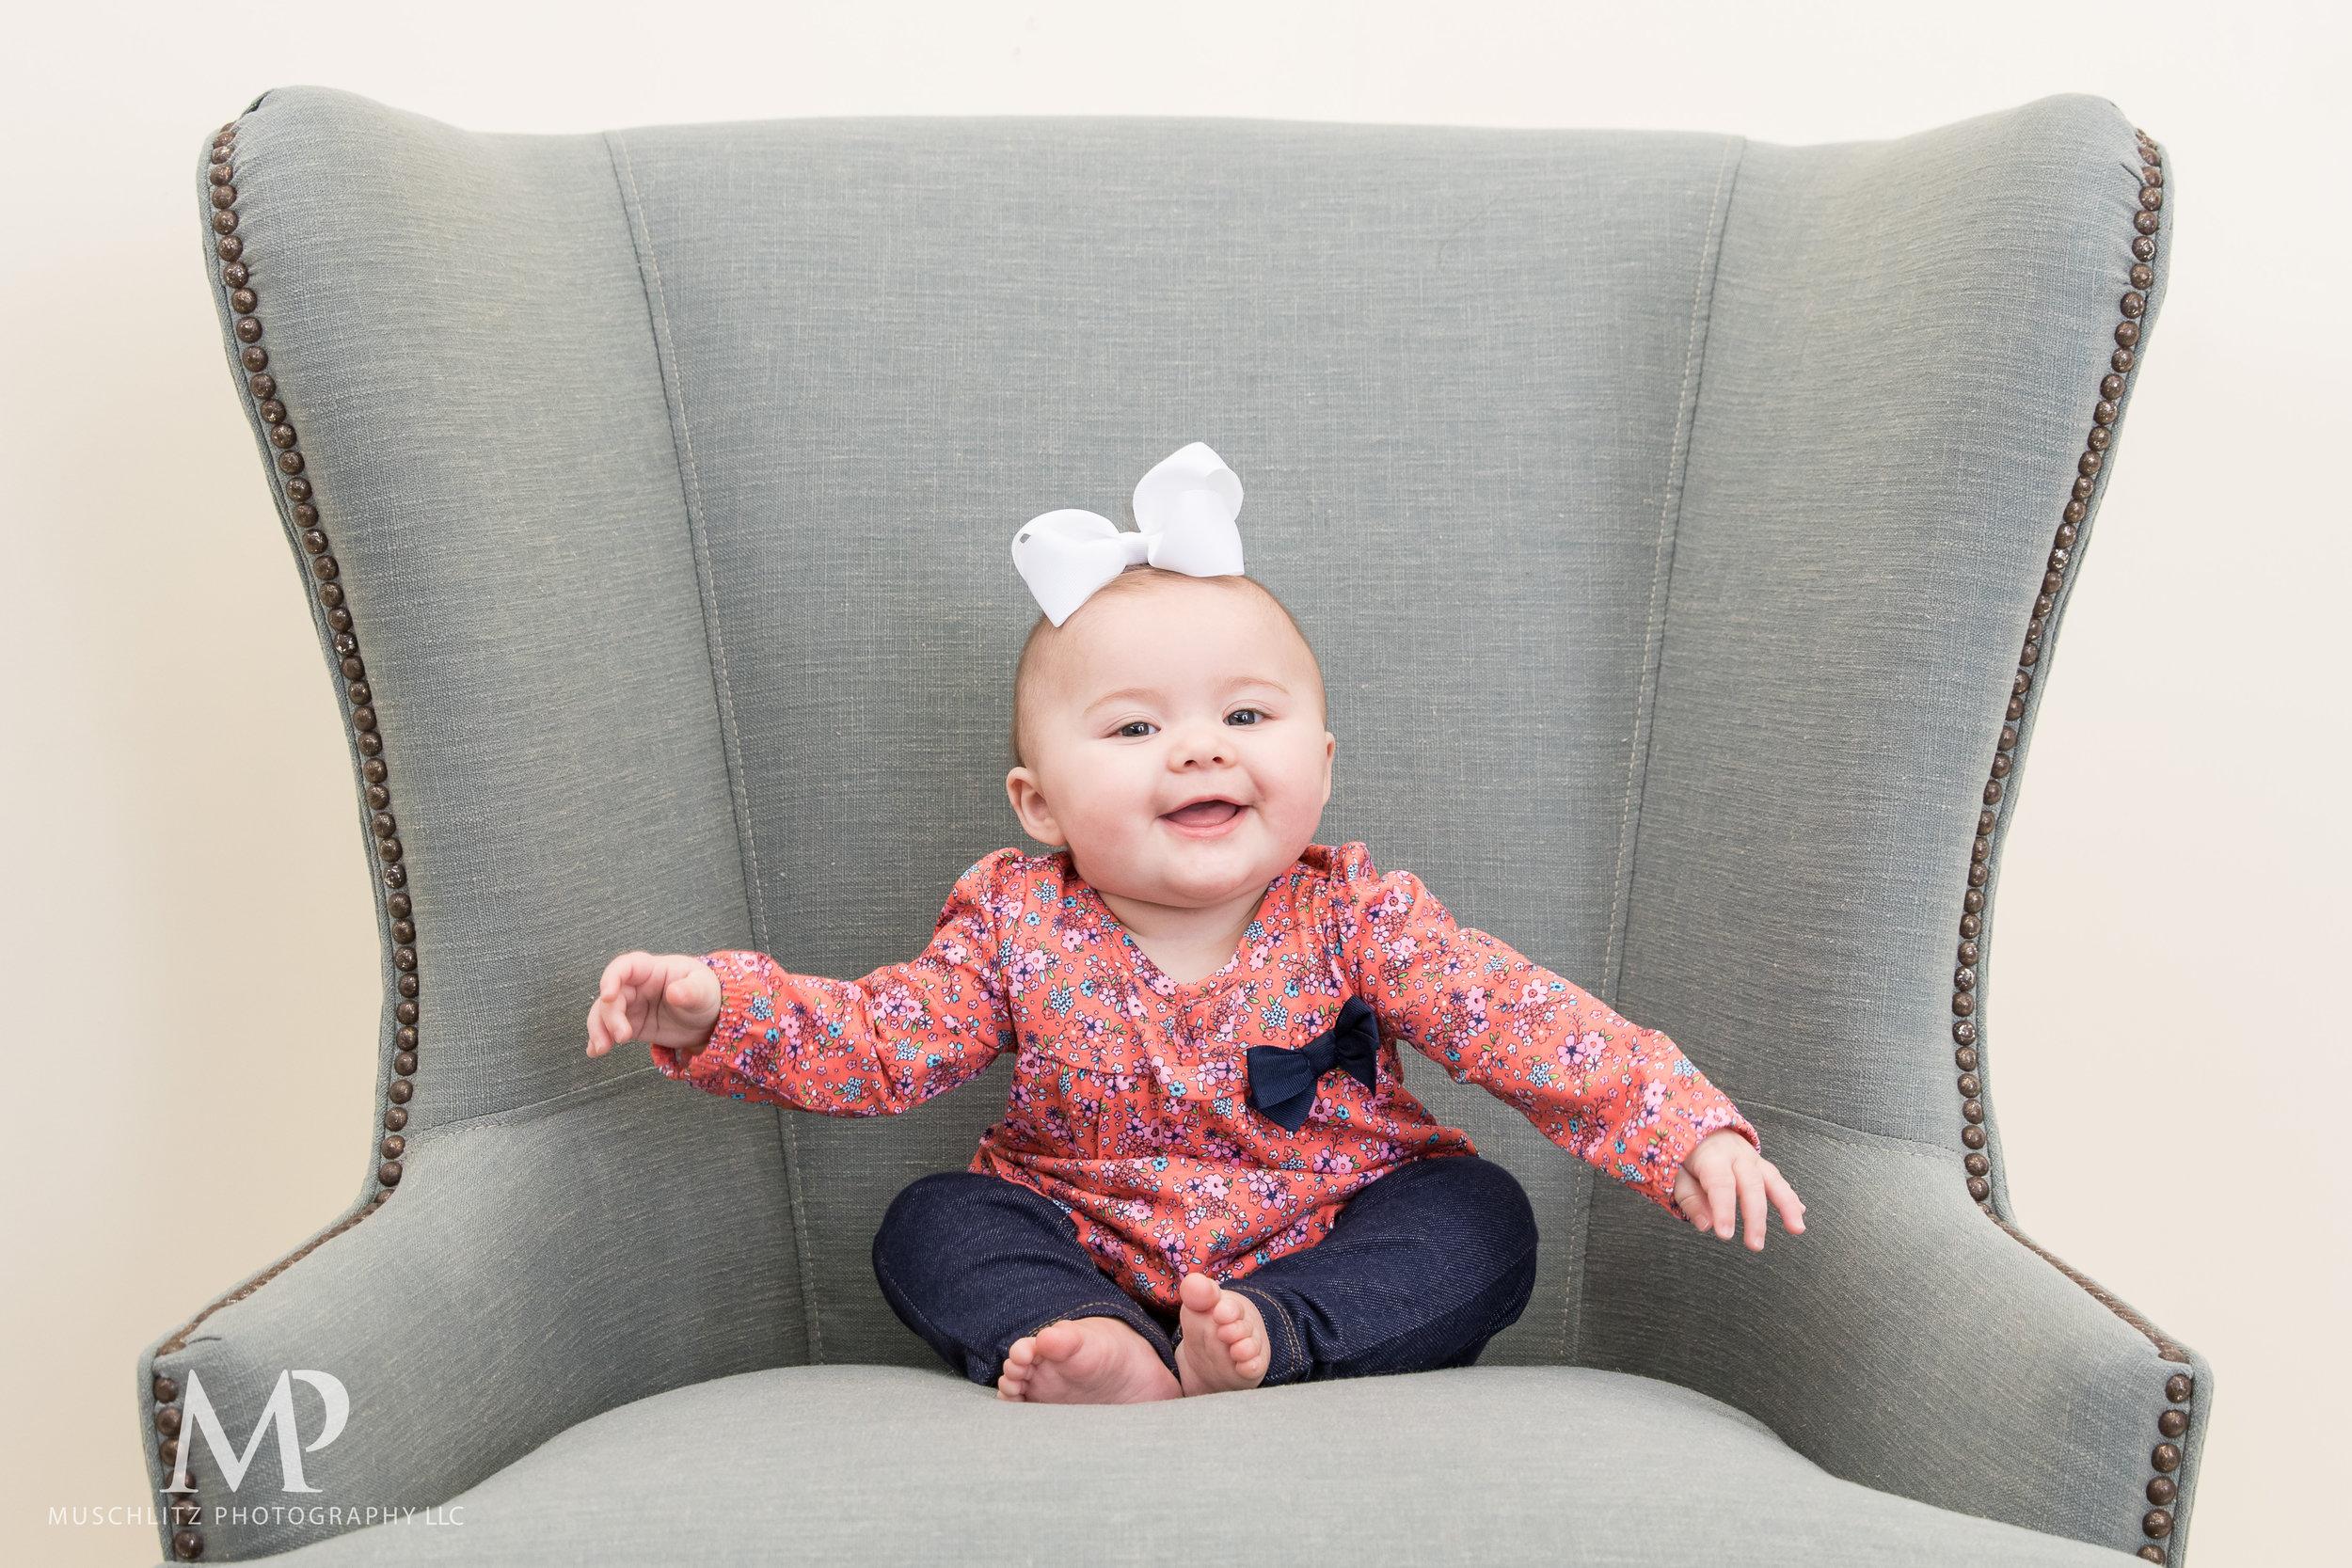 6-month-portraits-baby-photographer-columbus-ohio-gahanna-muschlitz-photography-008.JPG